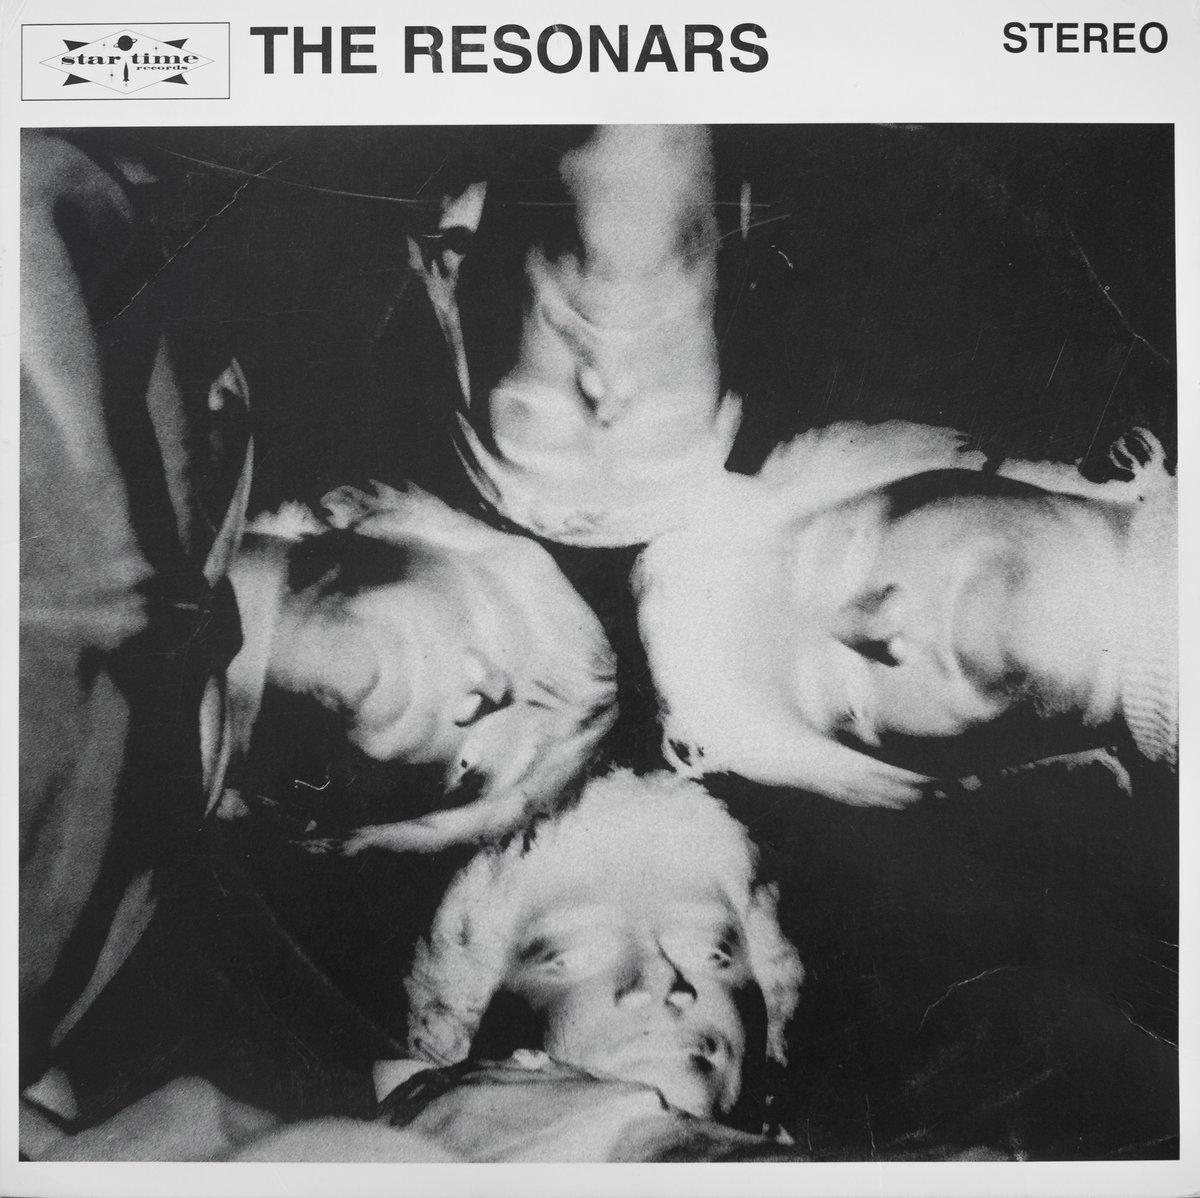 The Resonars (mono version) | The Resonars